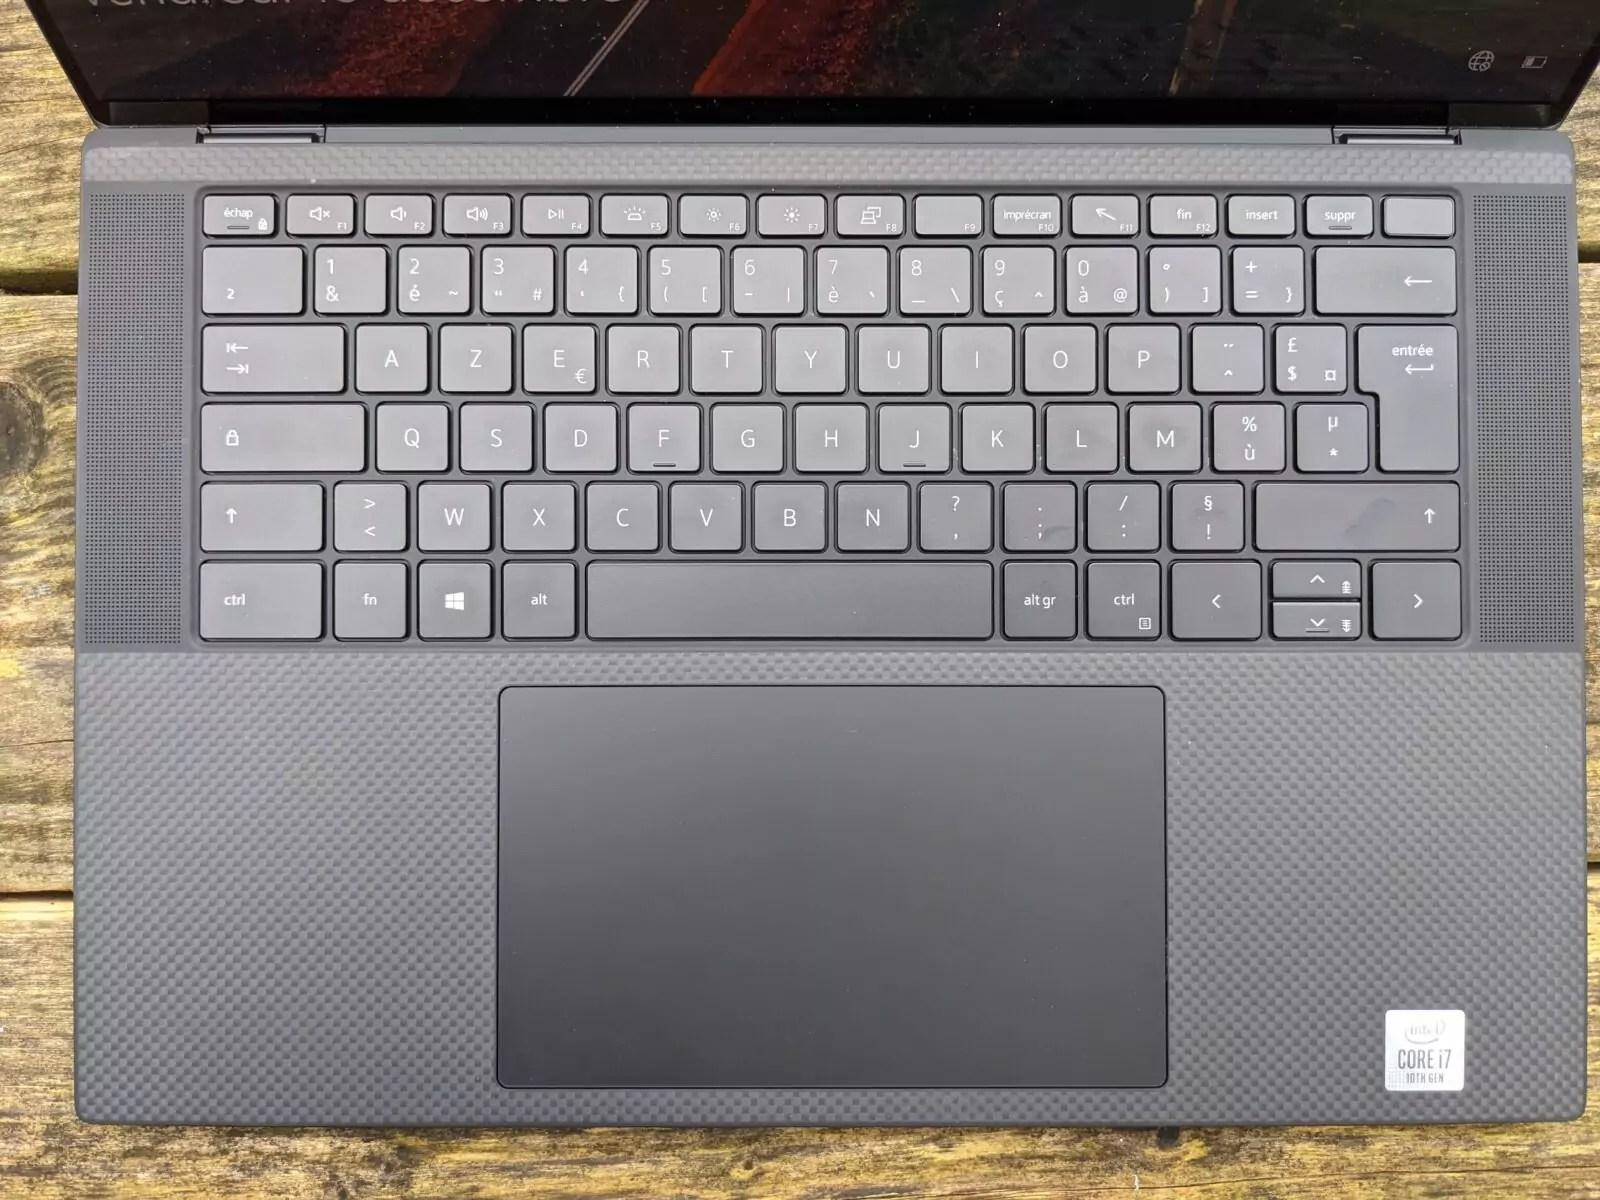 dell xps 15 clavier